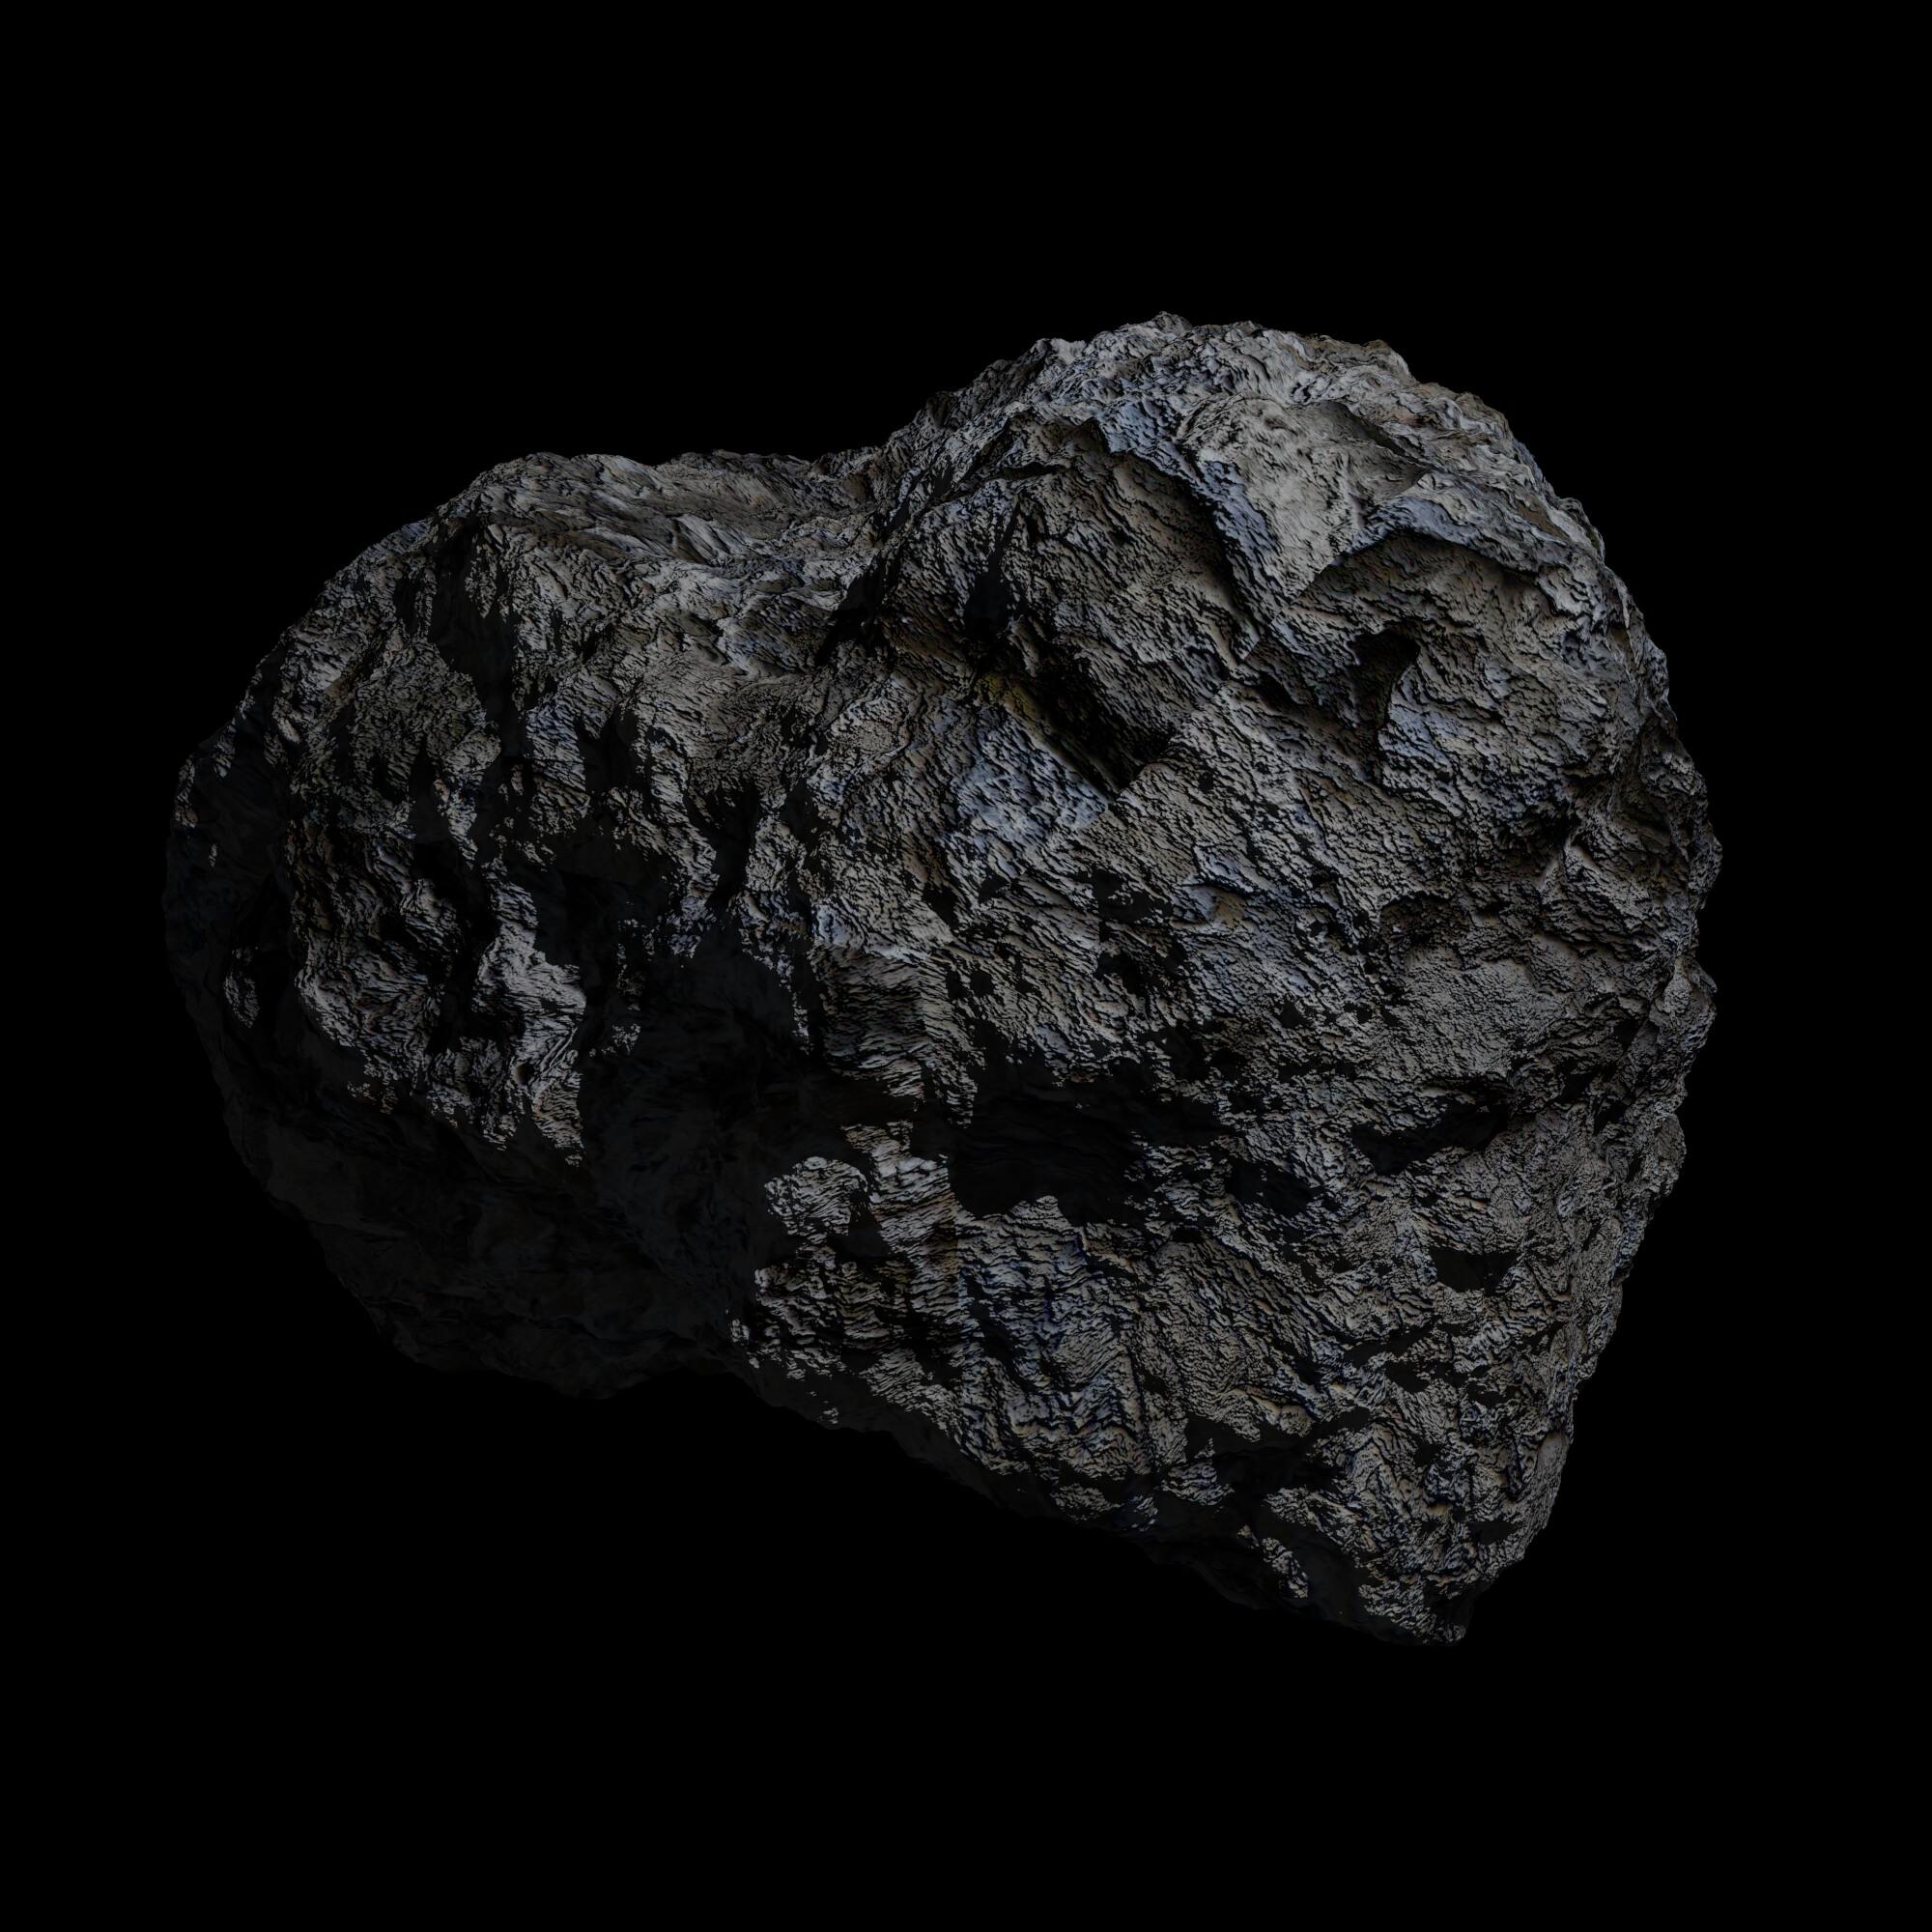 fantasy asteroid 3d model 3ds blend dae obj 266931